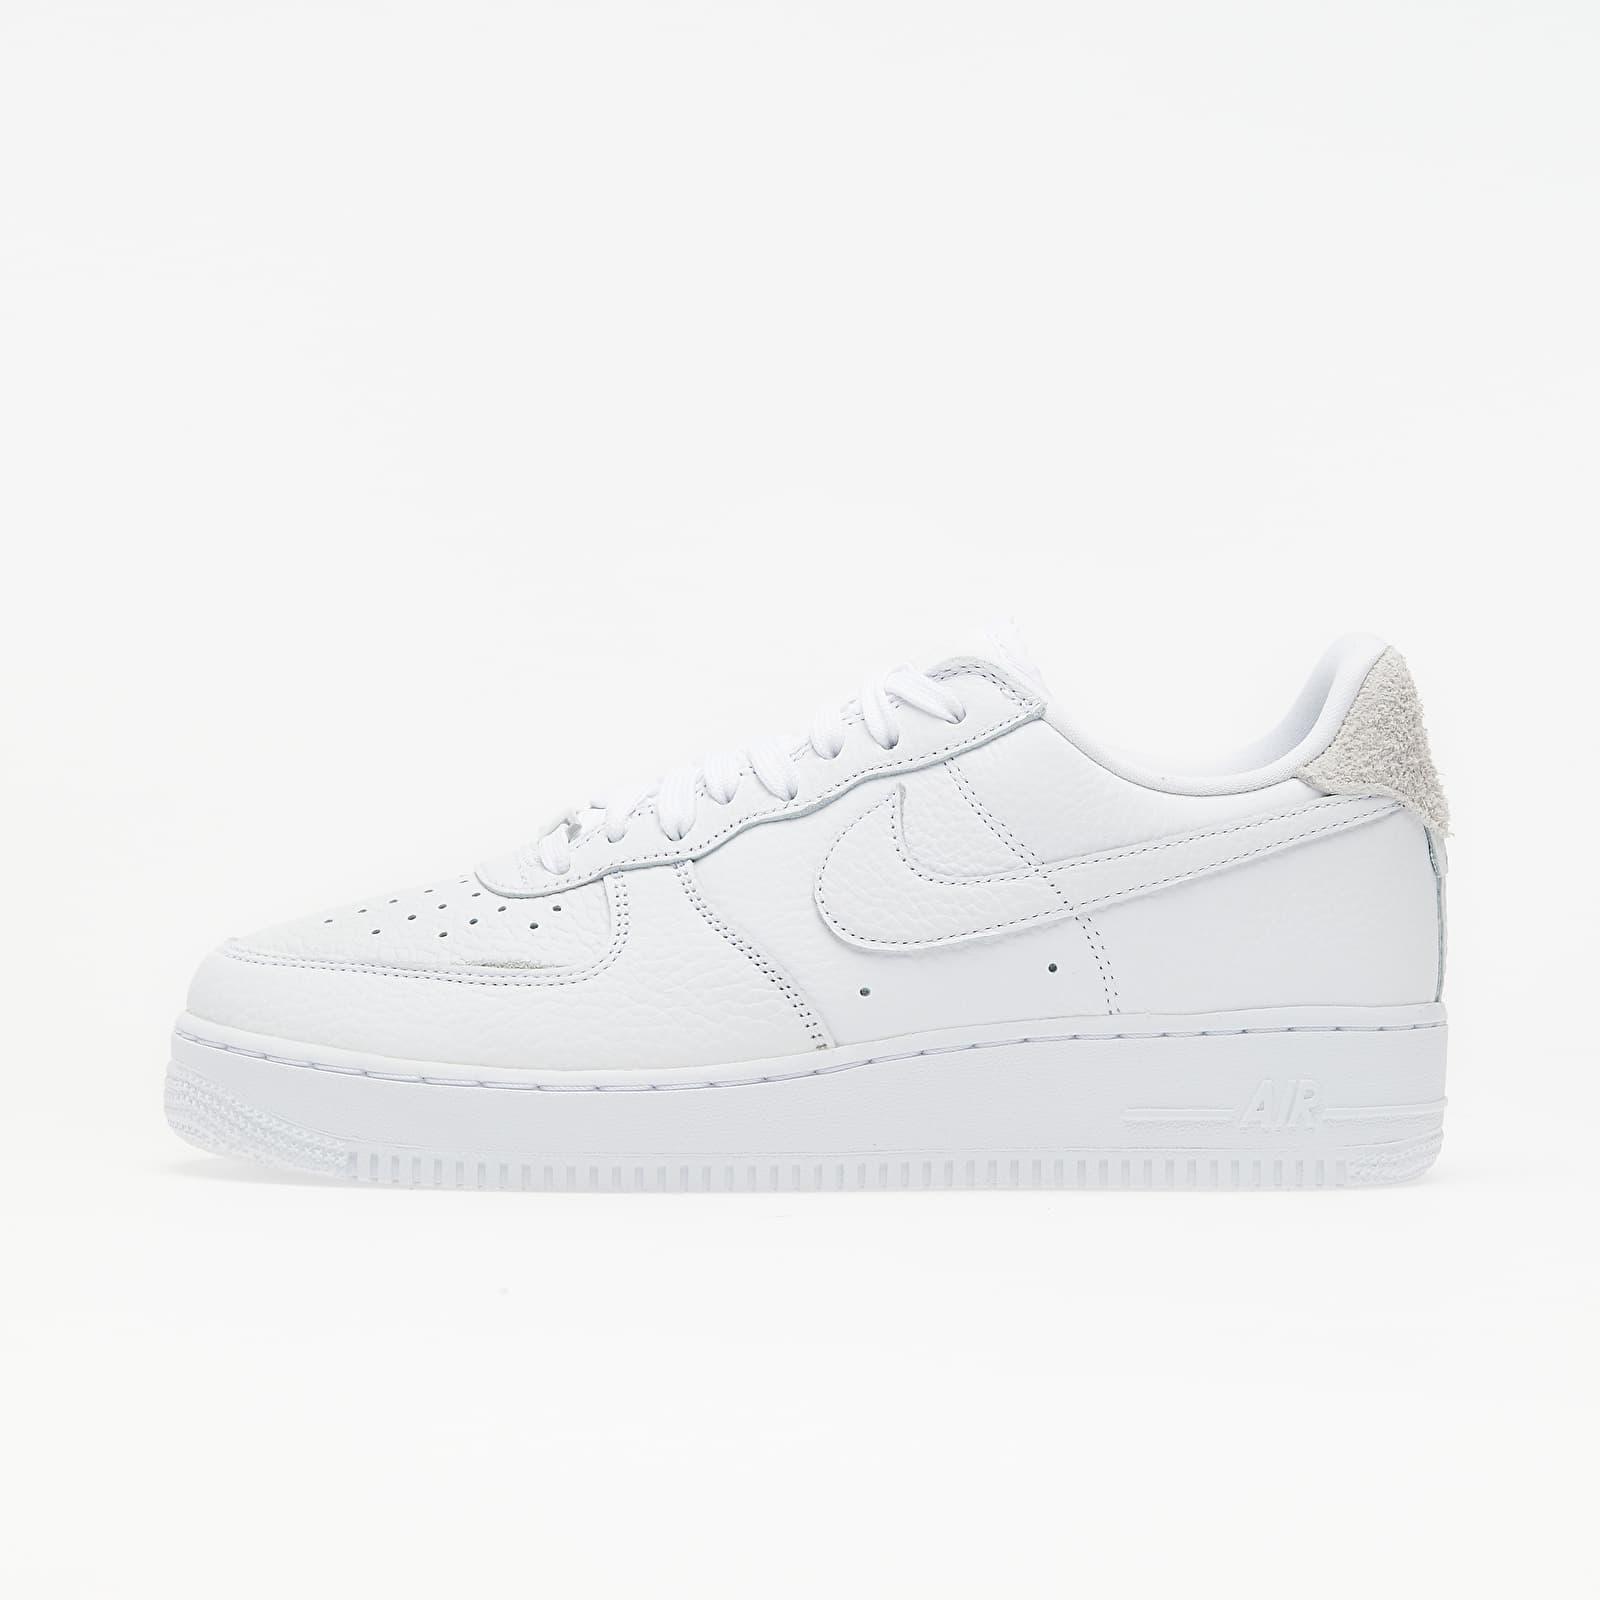 Nike Air Force 1 '07 Craft White/ White-Summit White-Vast Grey EUR 46